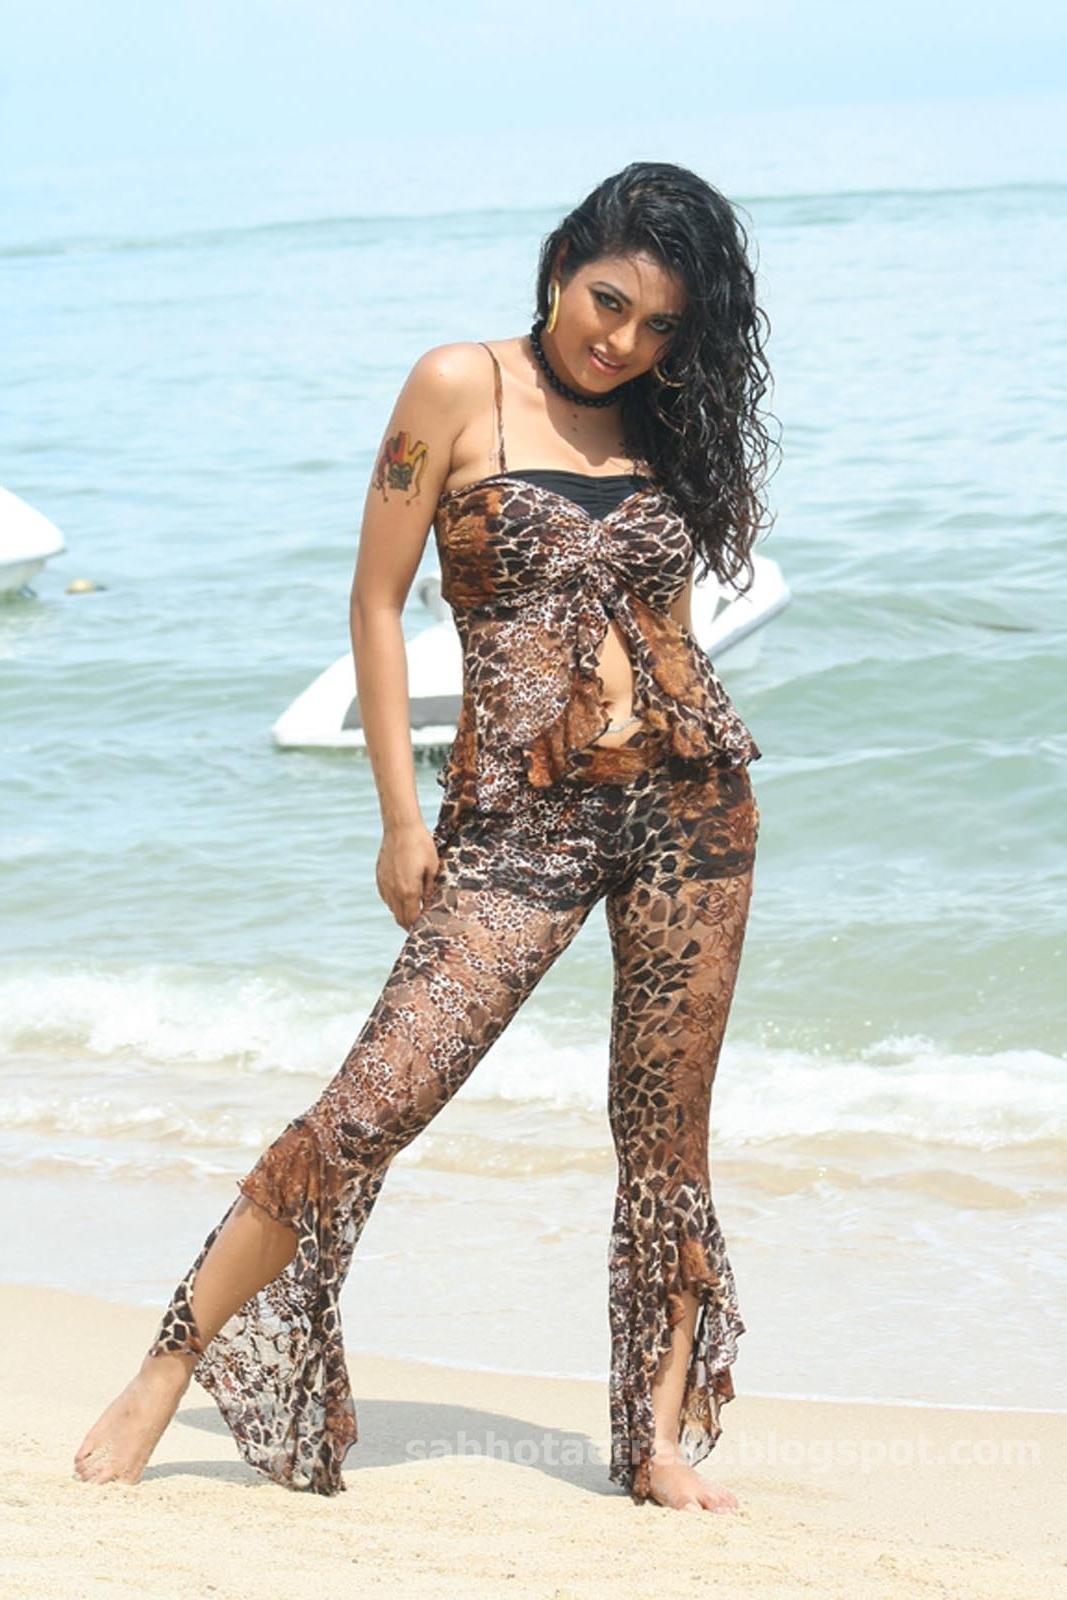 nudes Bikini Meenakshi (12 foto) Porno, Twitter, lingerie